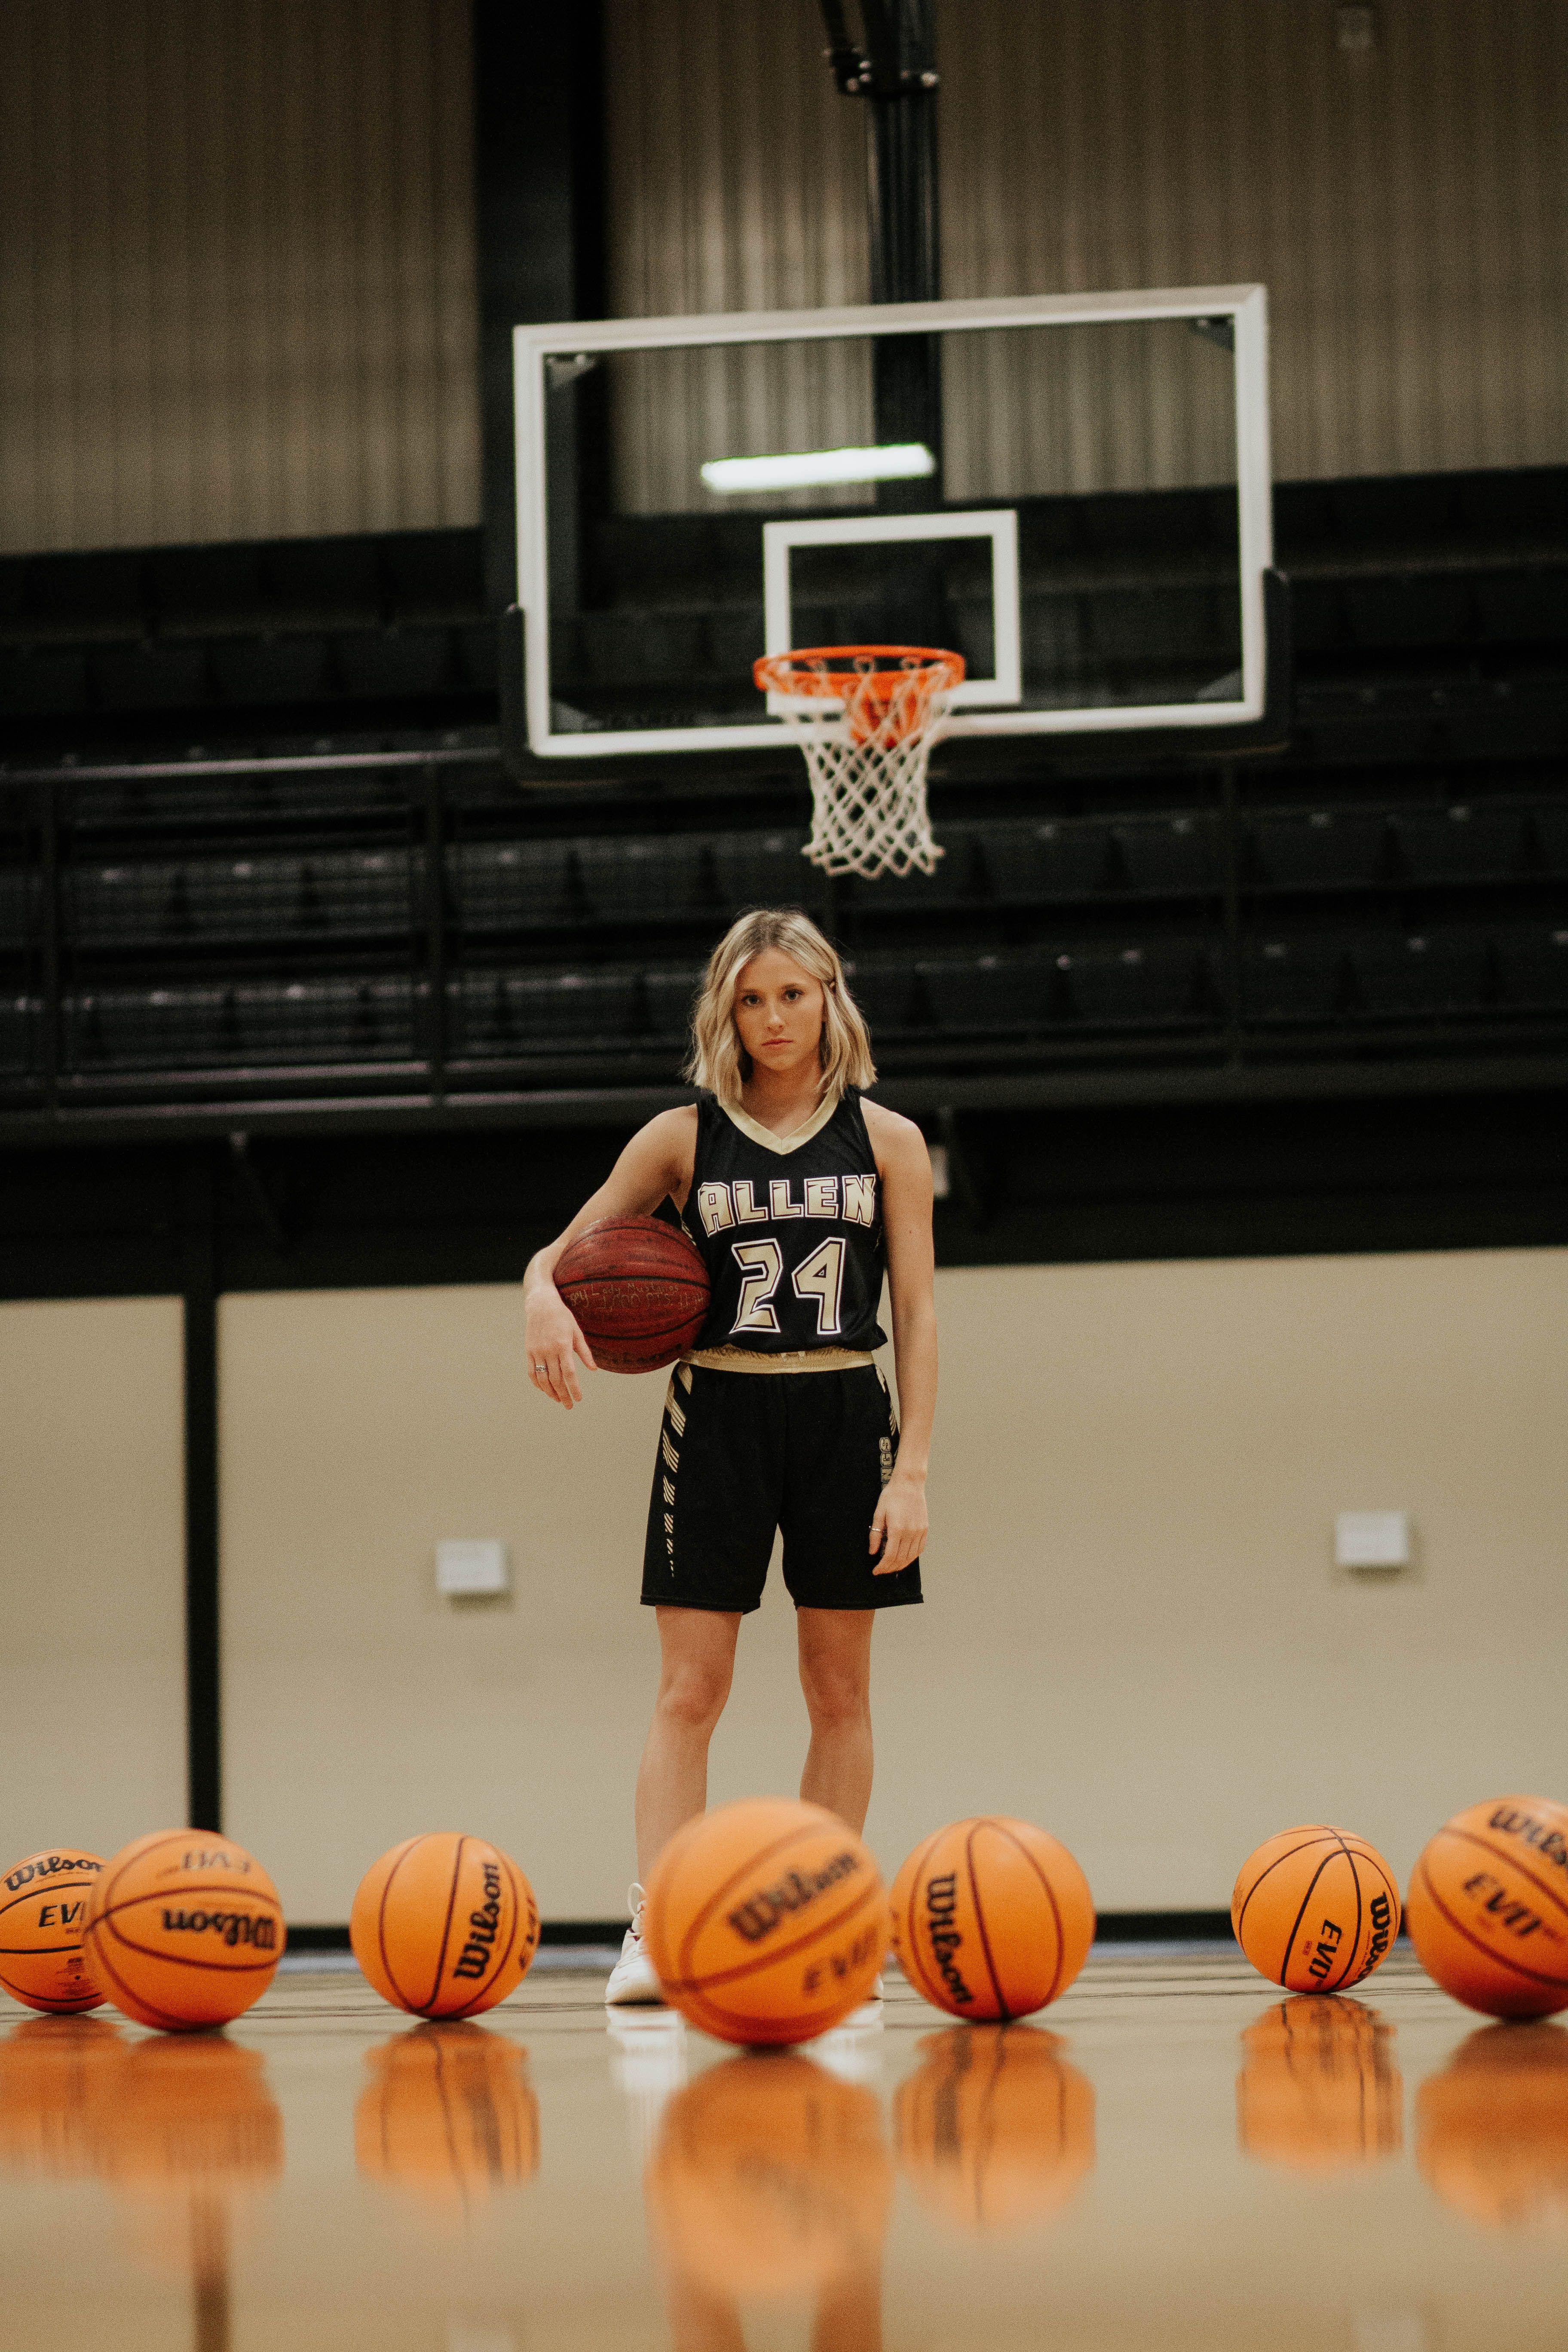 Senior Pictures Basketball Basketball Senior Pictures Basketball Pictures Poses Senior Cheer Pictures